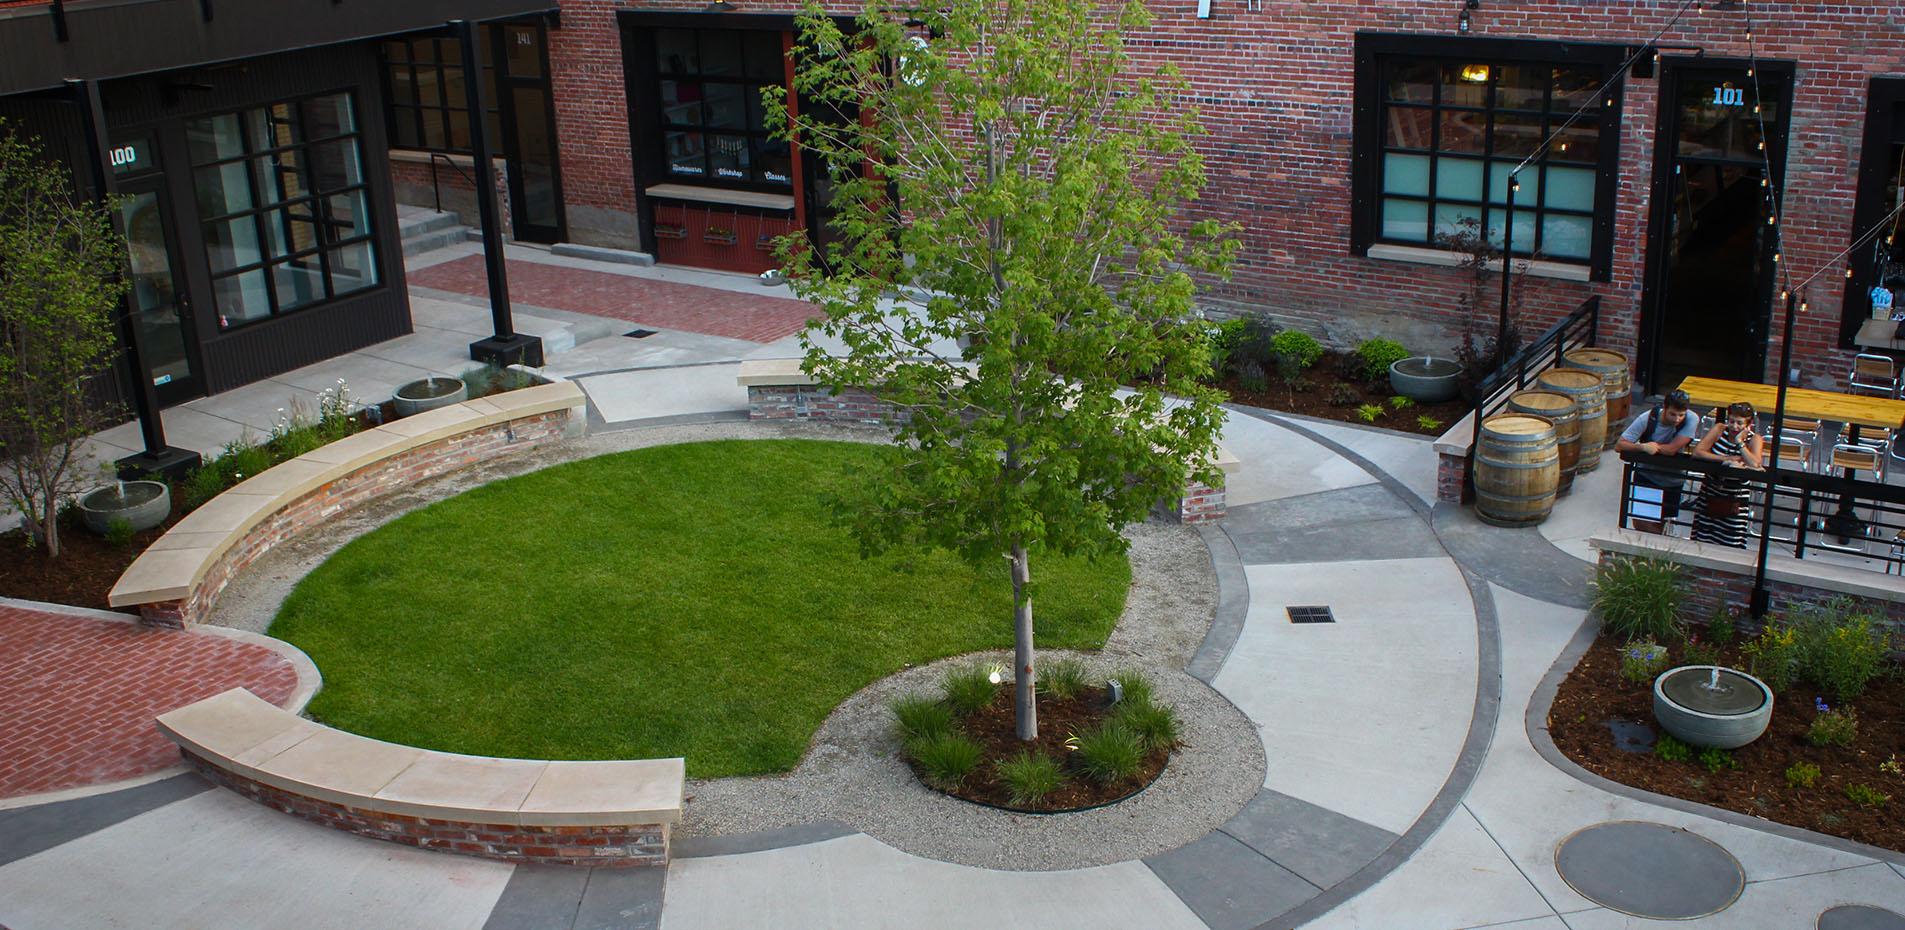 landscape architecture that transforms enriches your outdoor space